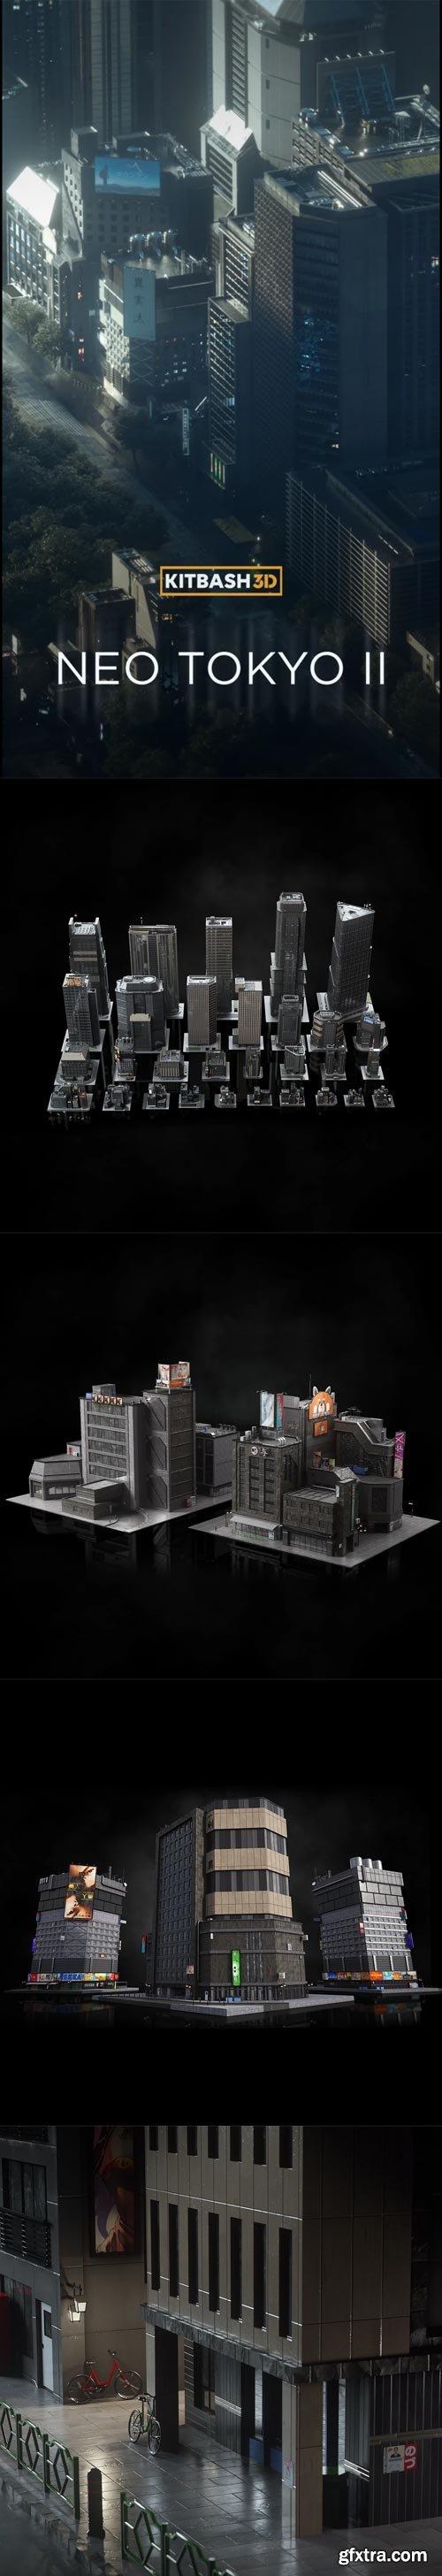 Kitbash3D - Neo Tokyo 2